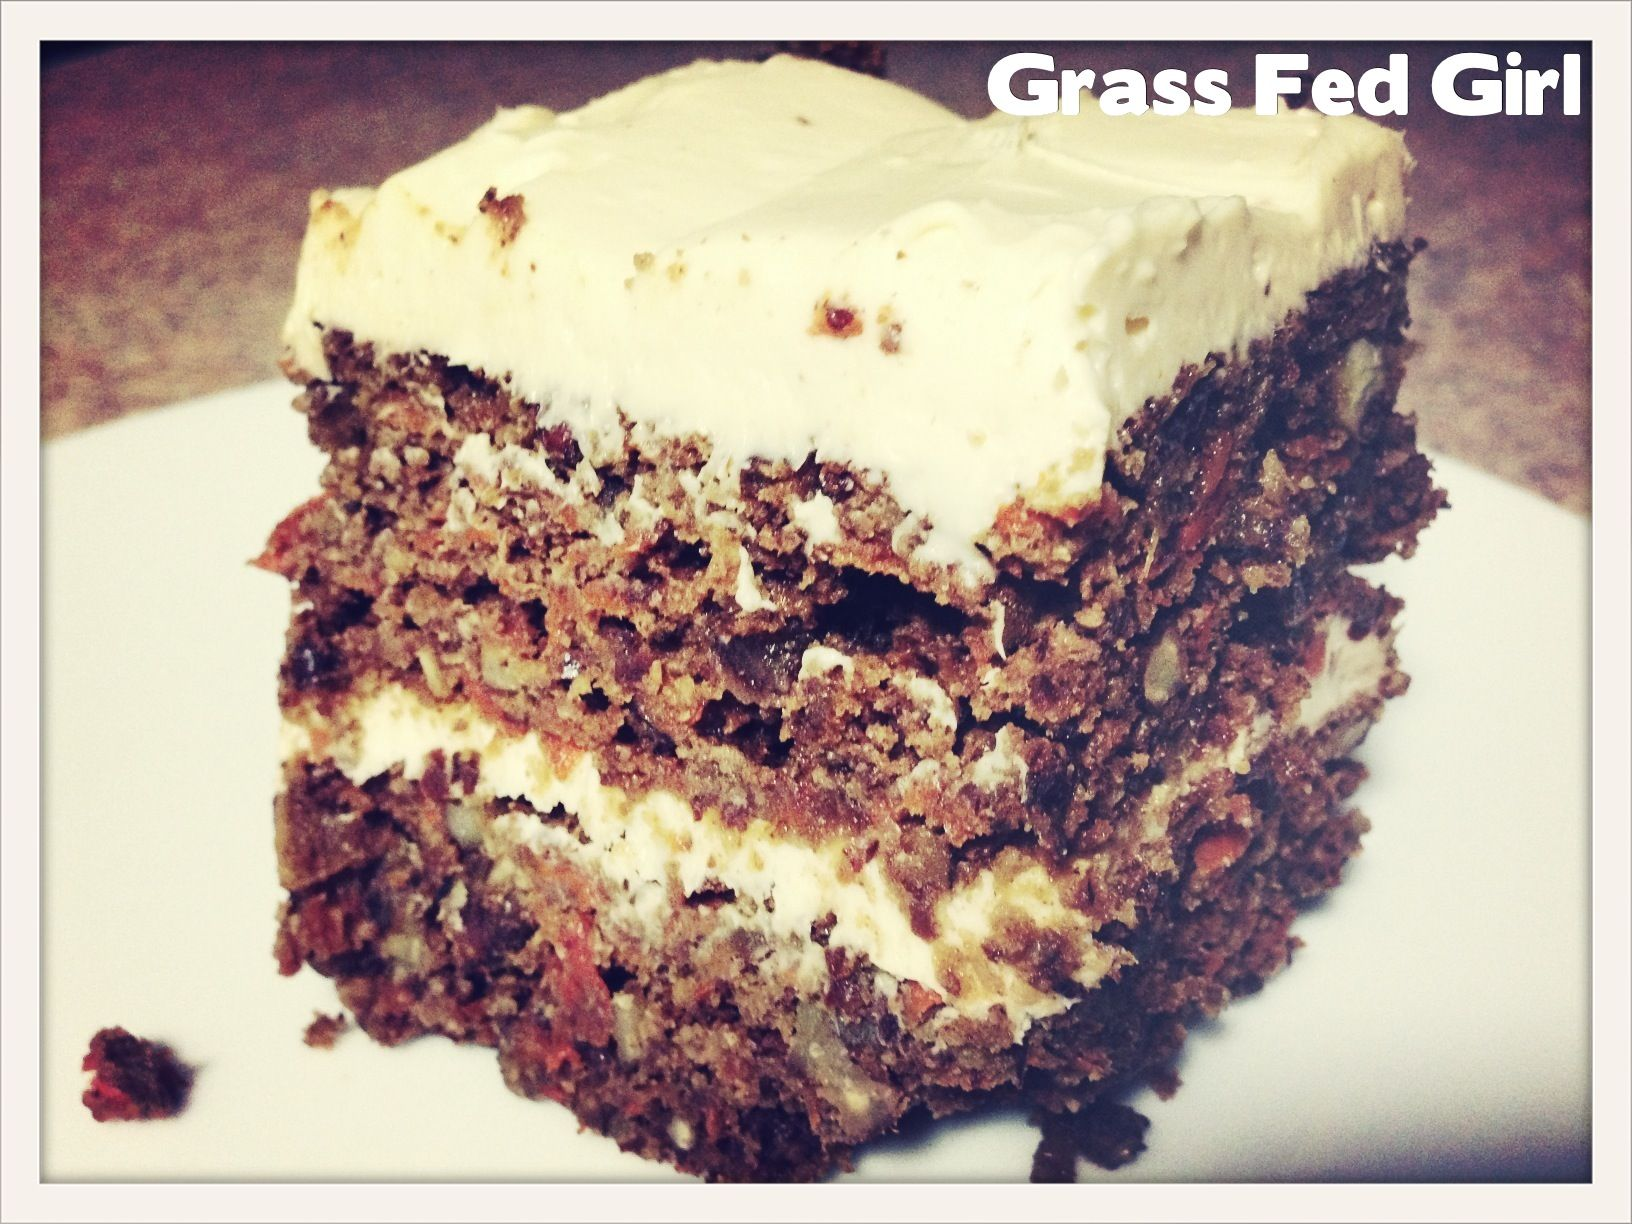 Keto Diet Carrot Cake Recipe: Paleo Desserts - Grass Fed